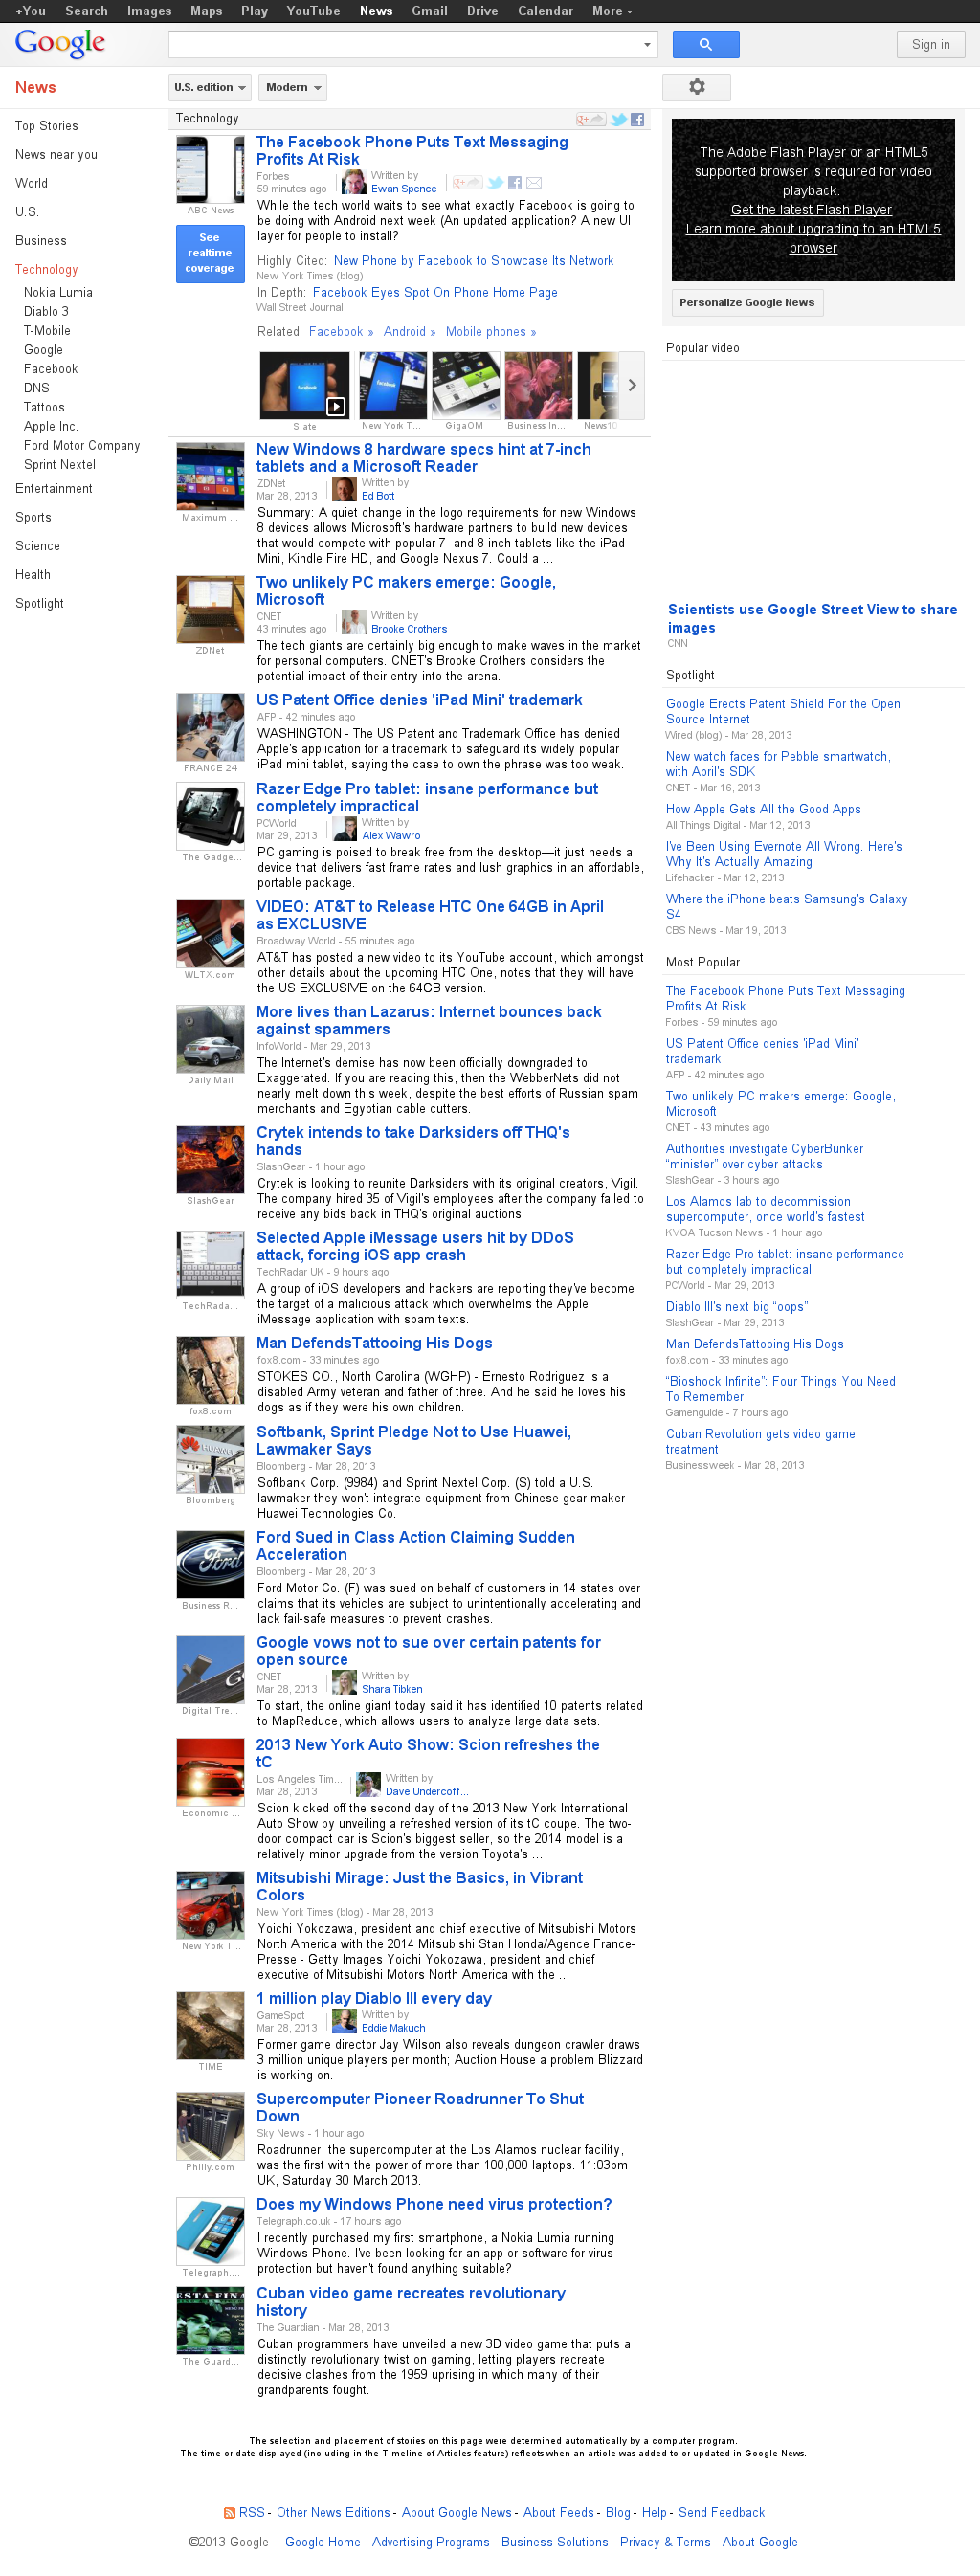 Google News: Technology at Sunday March 31, 2013, 12:08 a.m. UTC